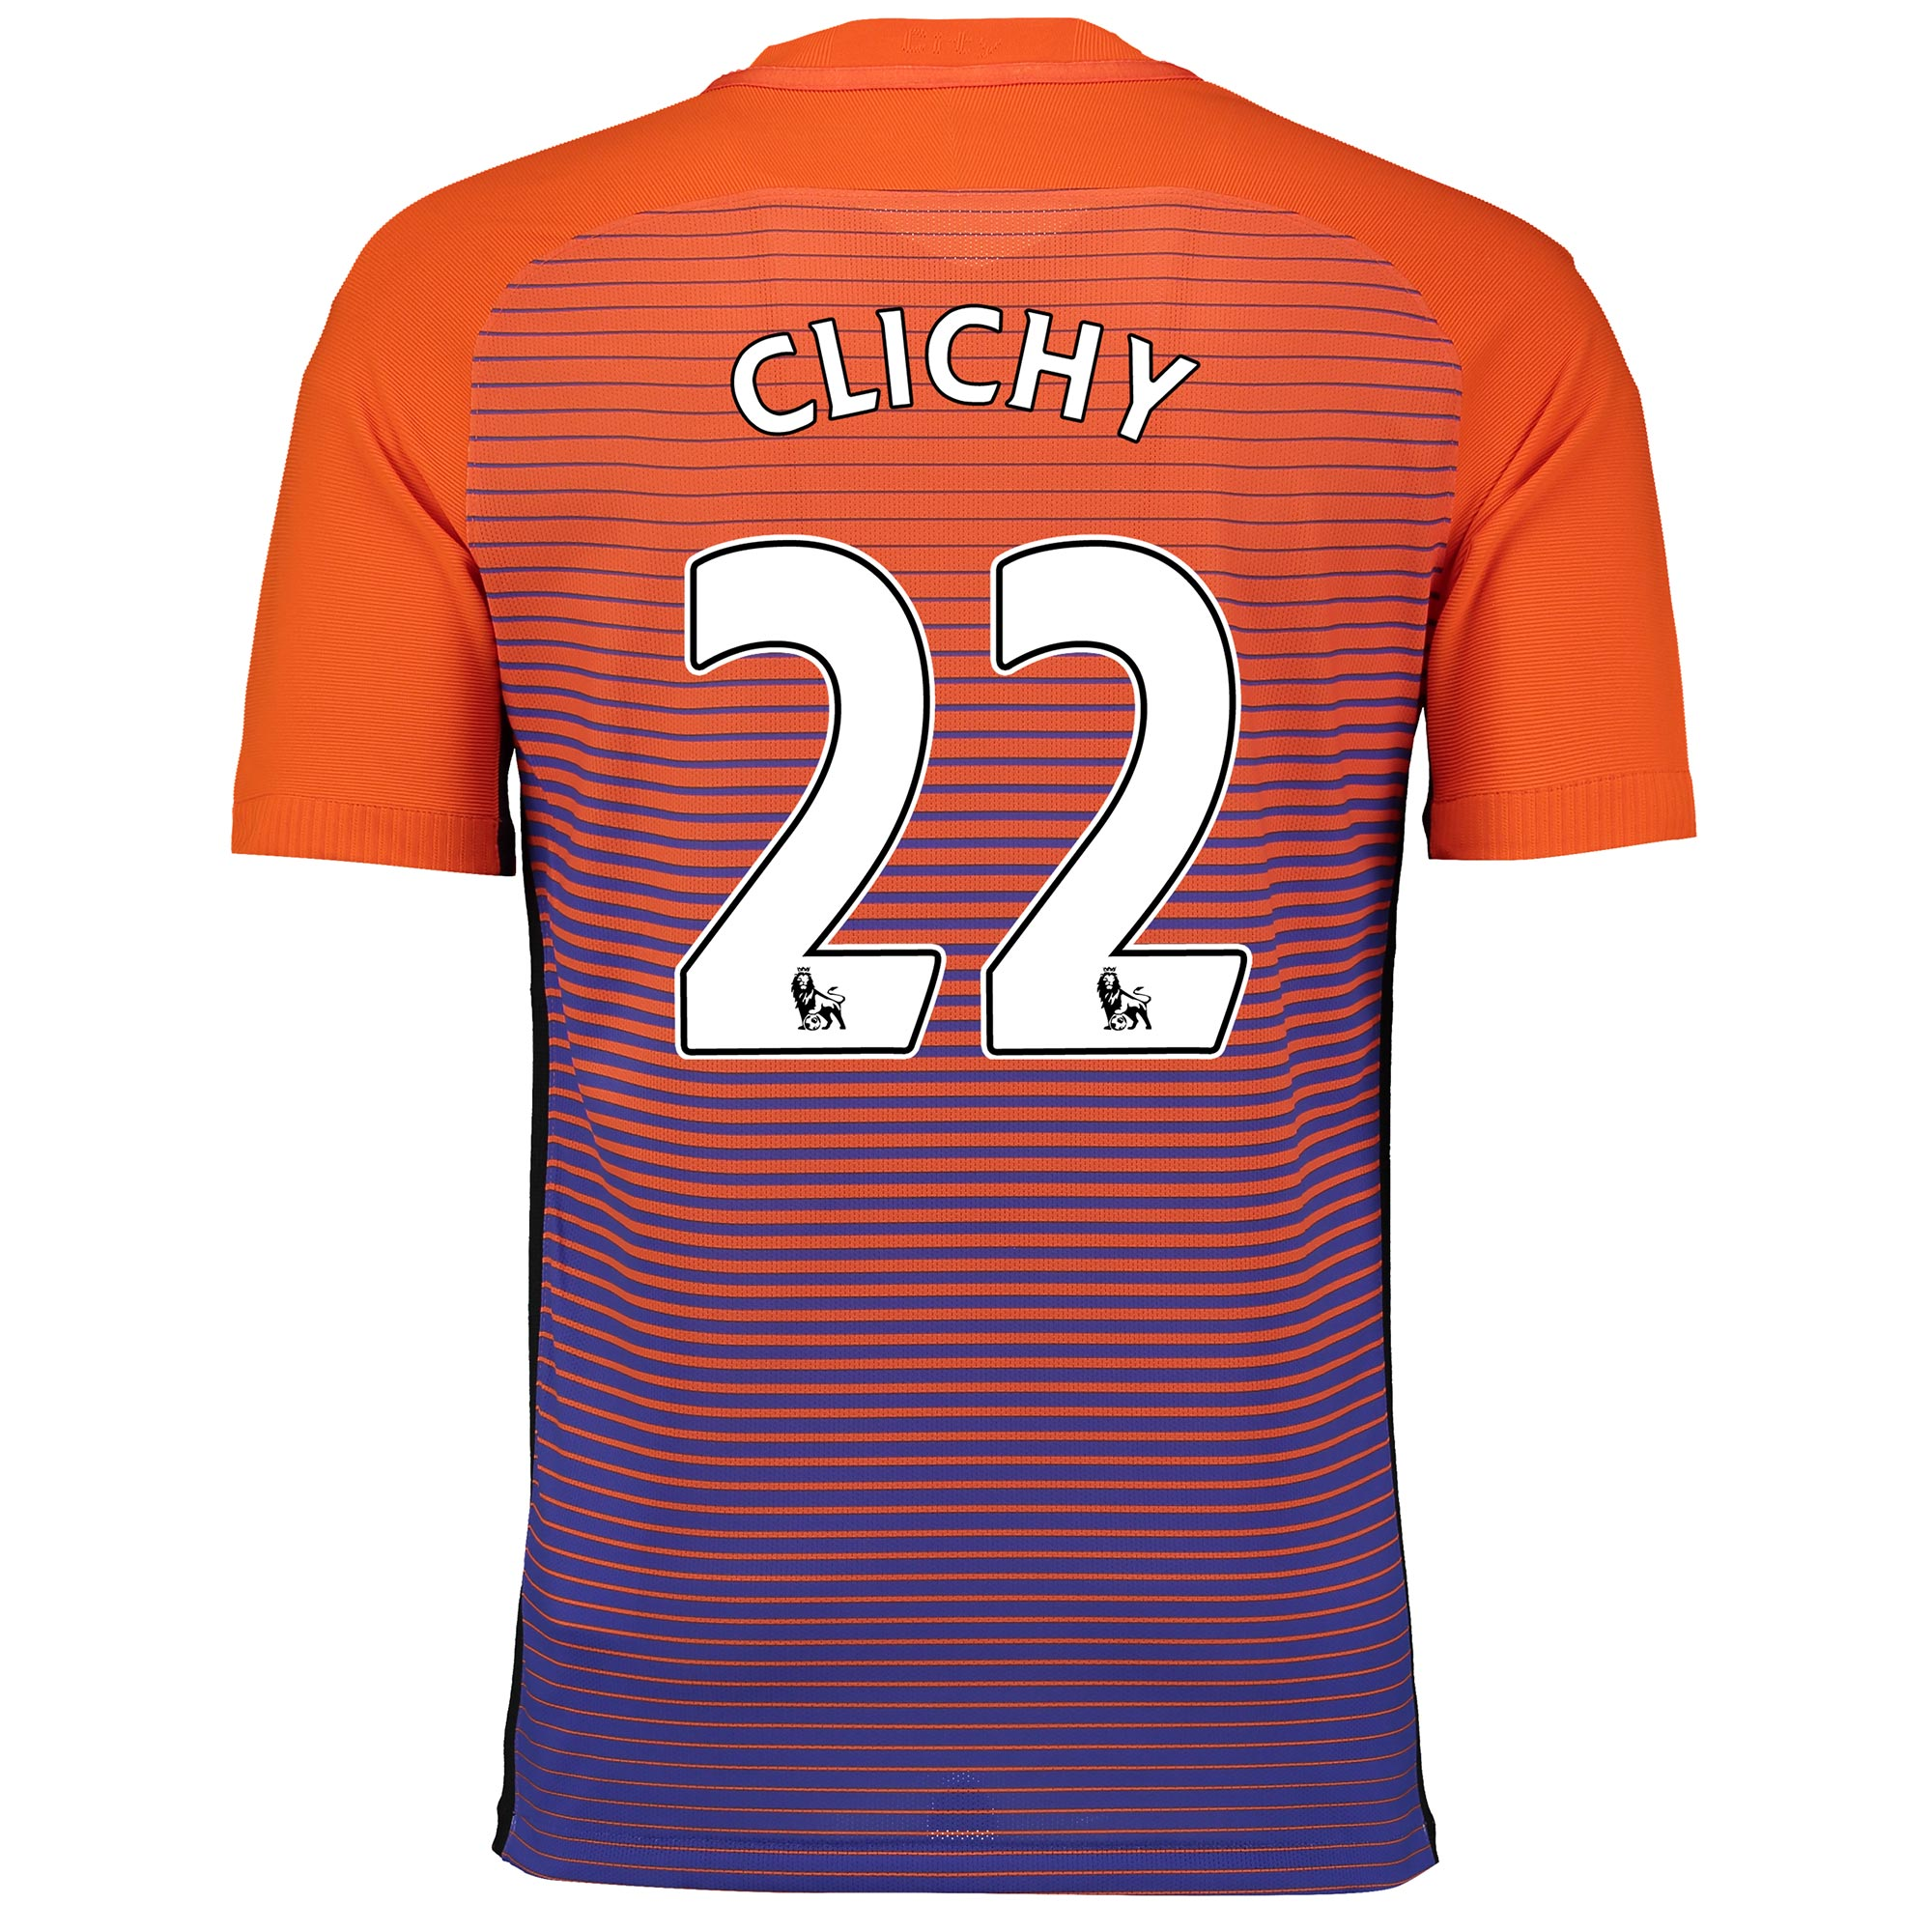 Manchester City Third Vapor Match Shirt 2016-17 with Clichy 22 printin